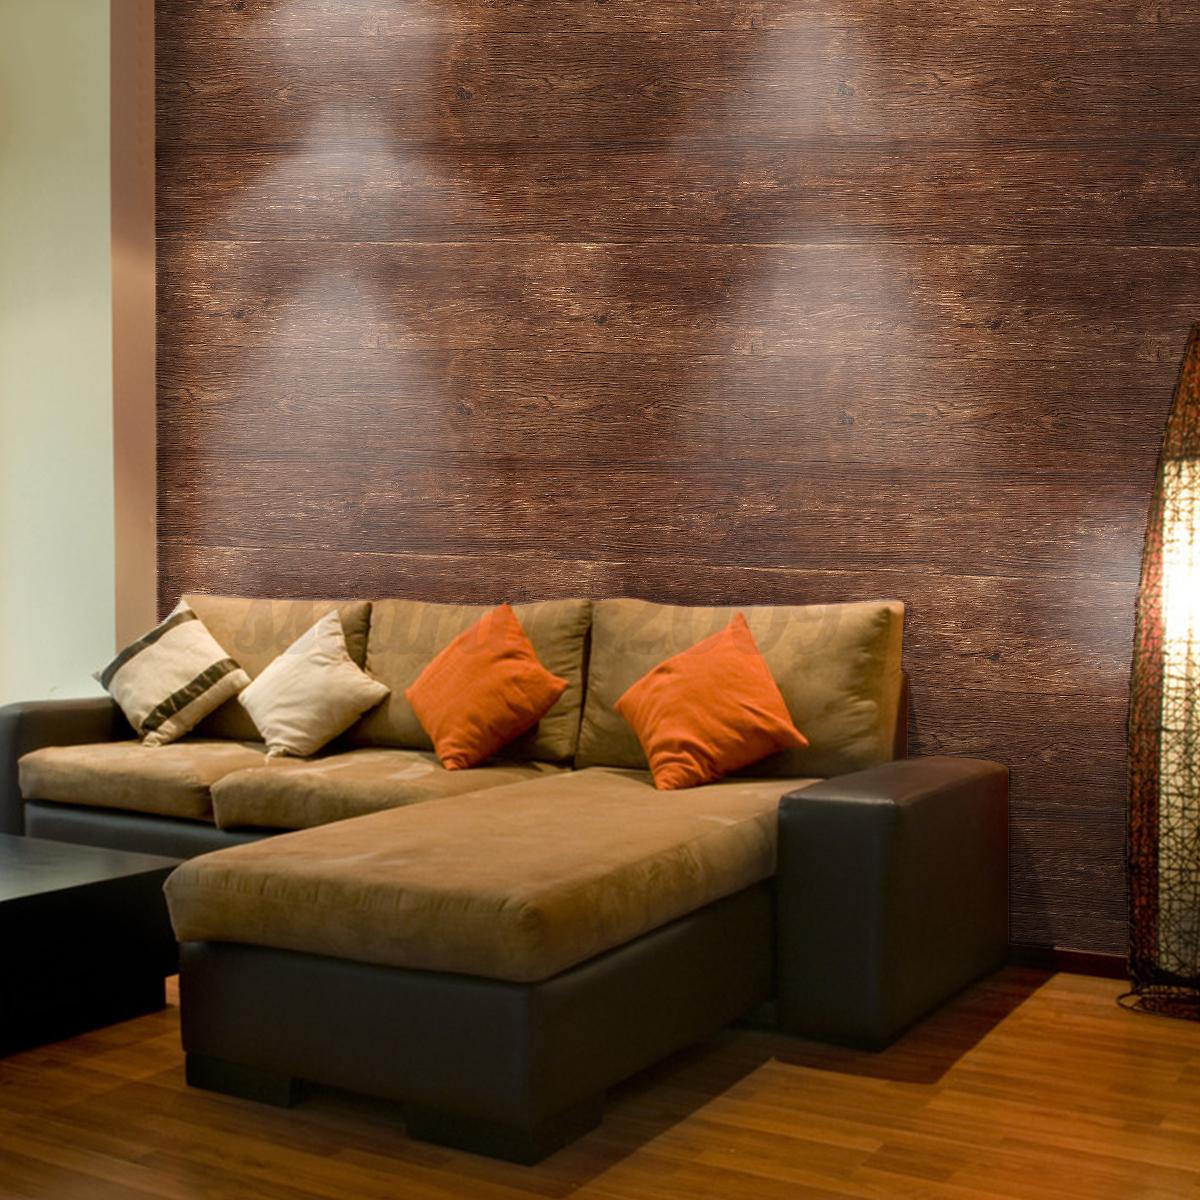 10m 3d papier peint murale mur wallpaper tv fond diy. Black Bedroom Furniture Sets. Home Design Ideas